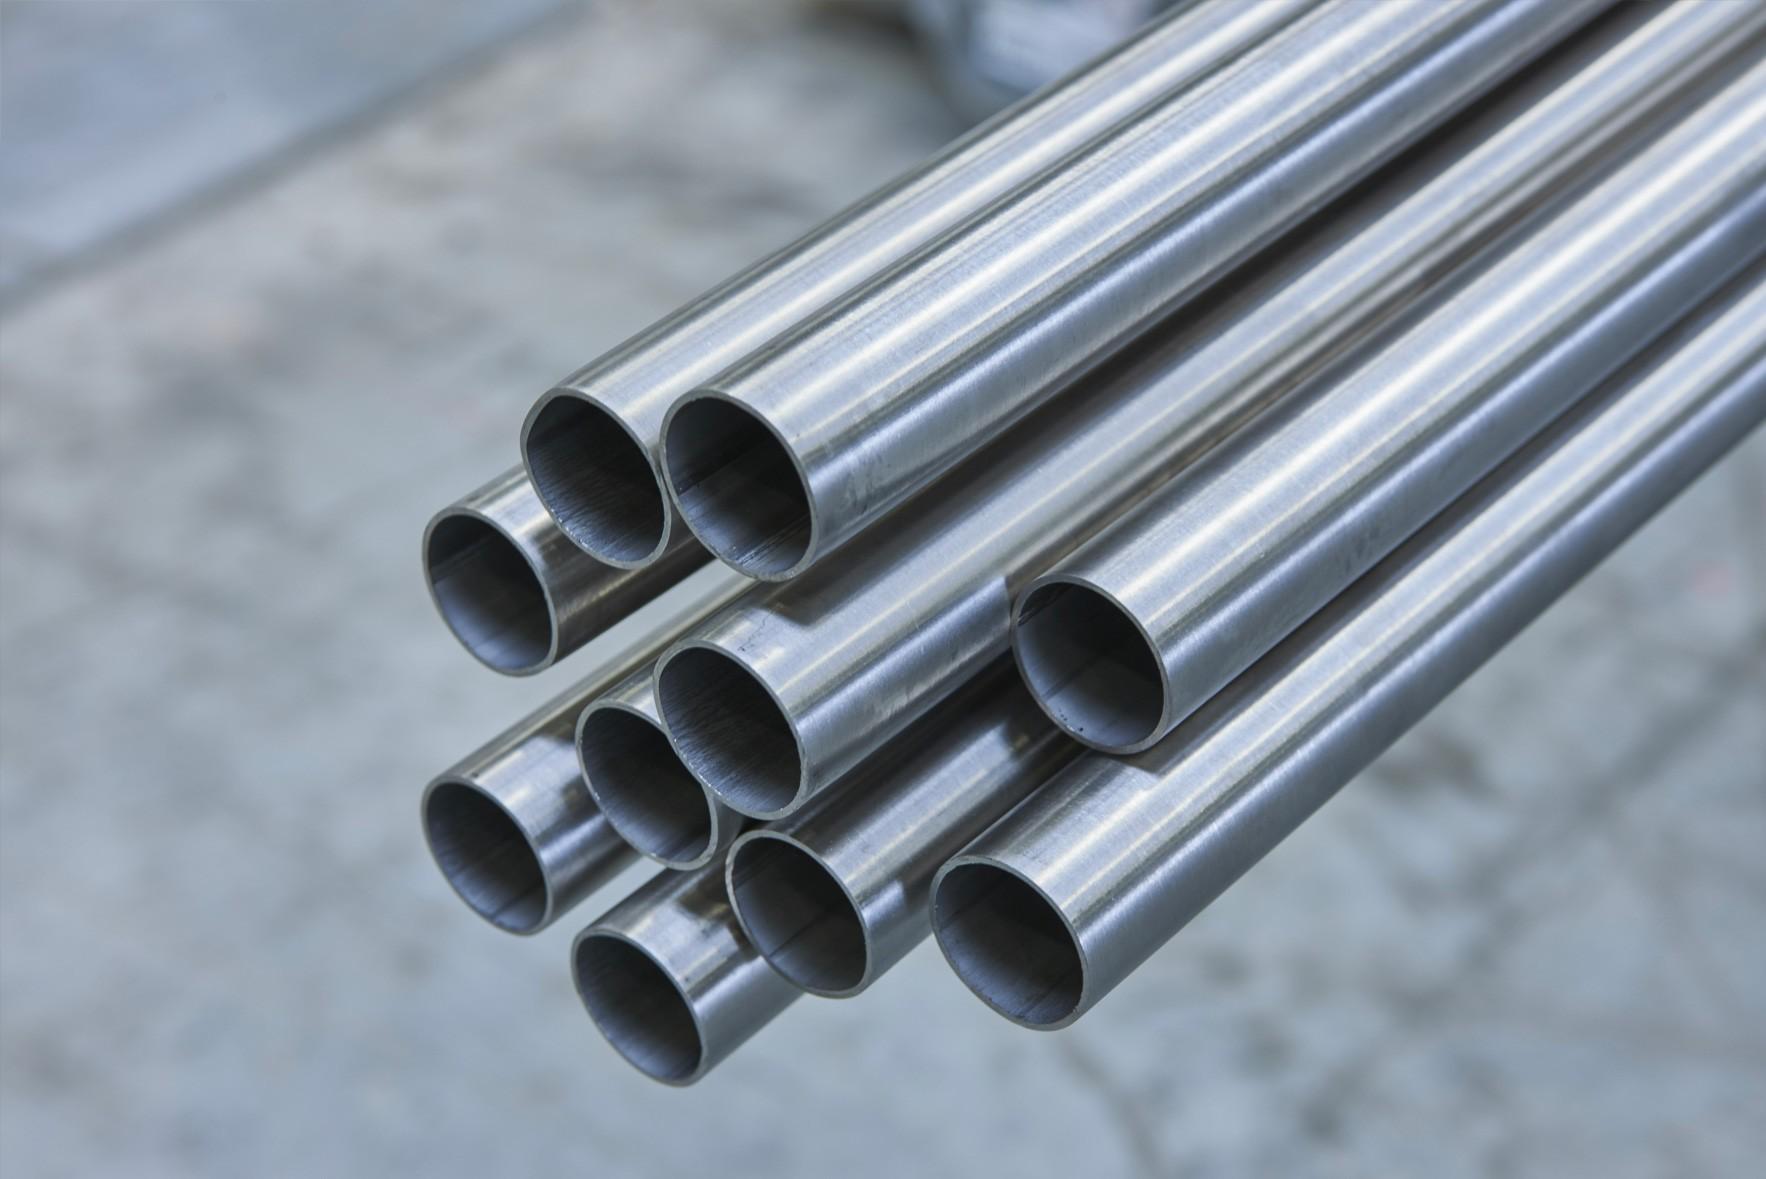 Tubolari metallo per espositori